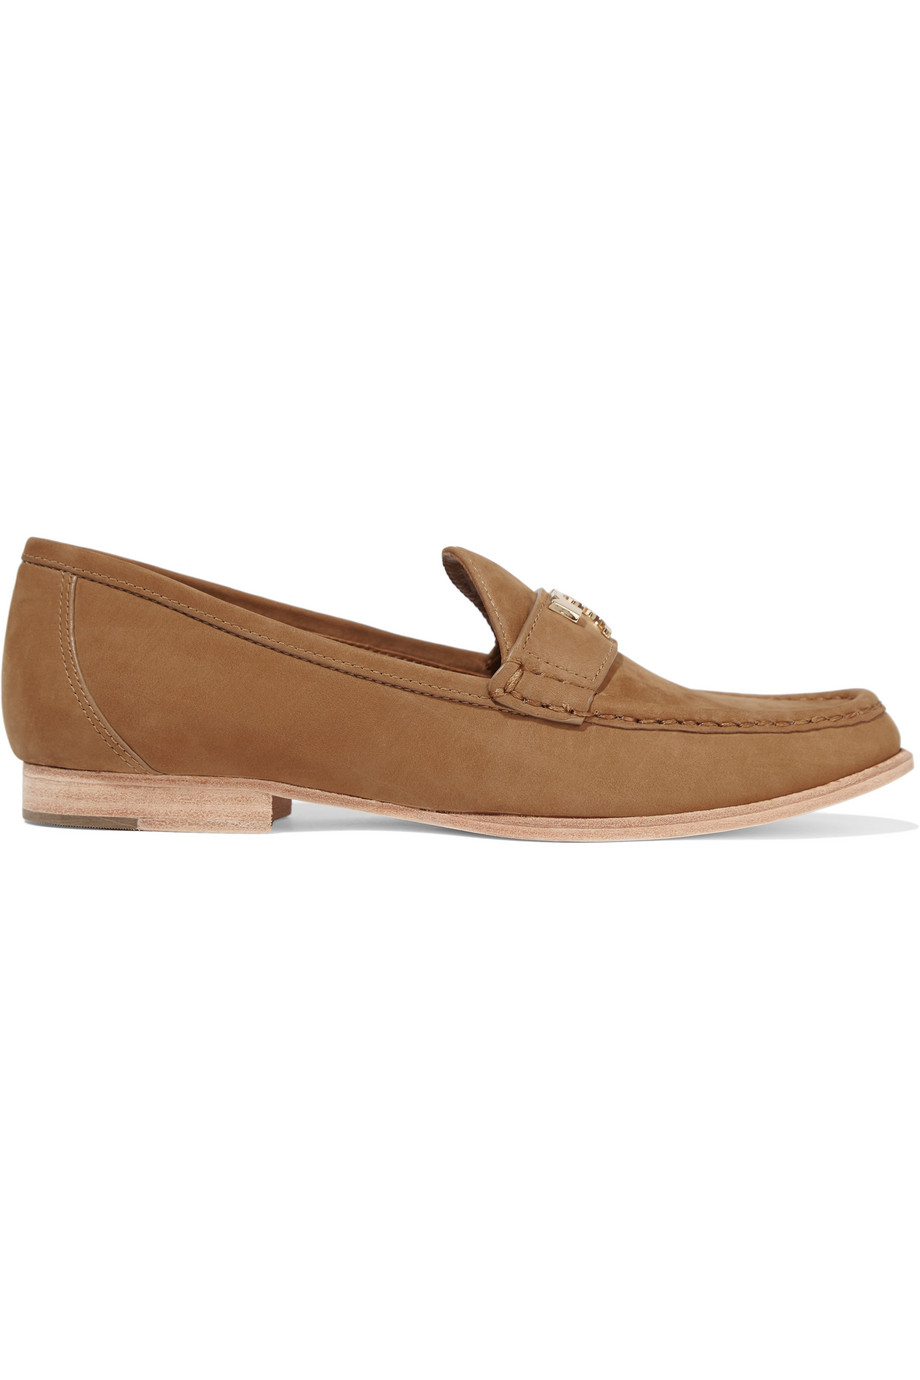 Tory Burch Townsend Nubuck Loafers, Tan, Women's, Size: 7.5